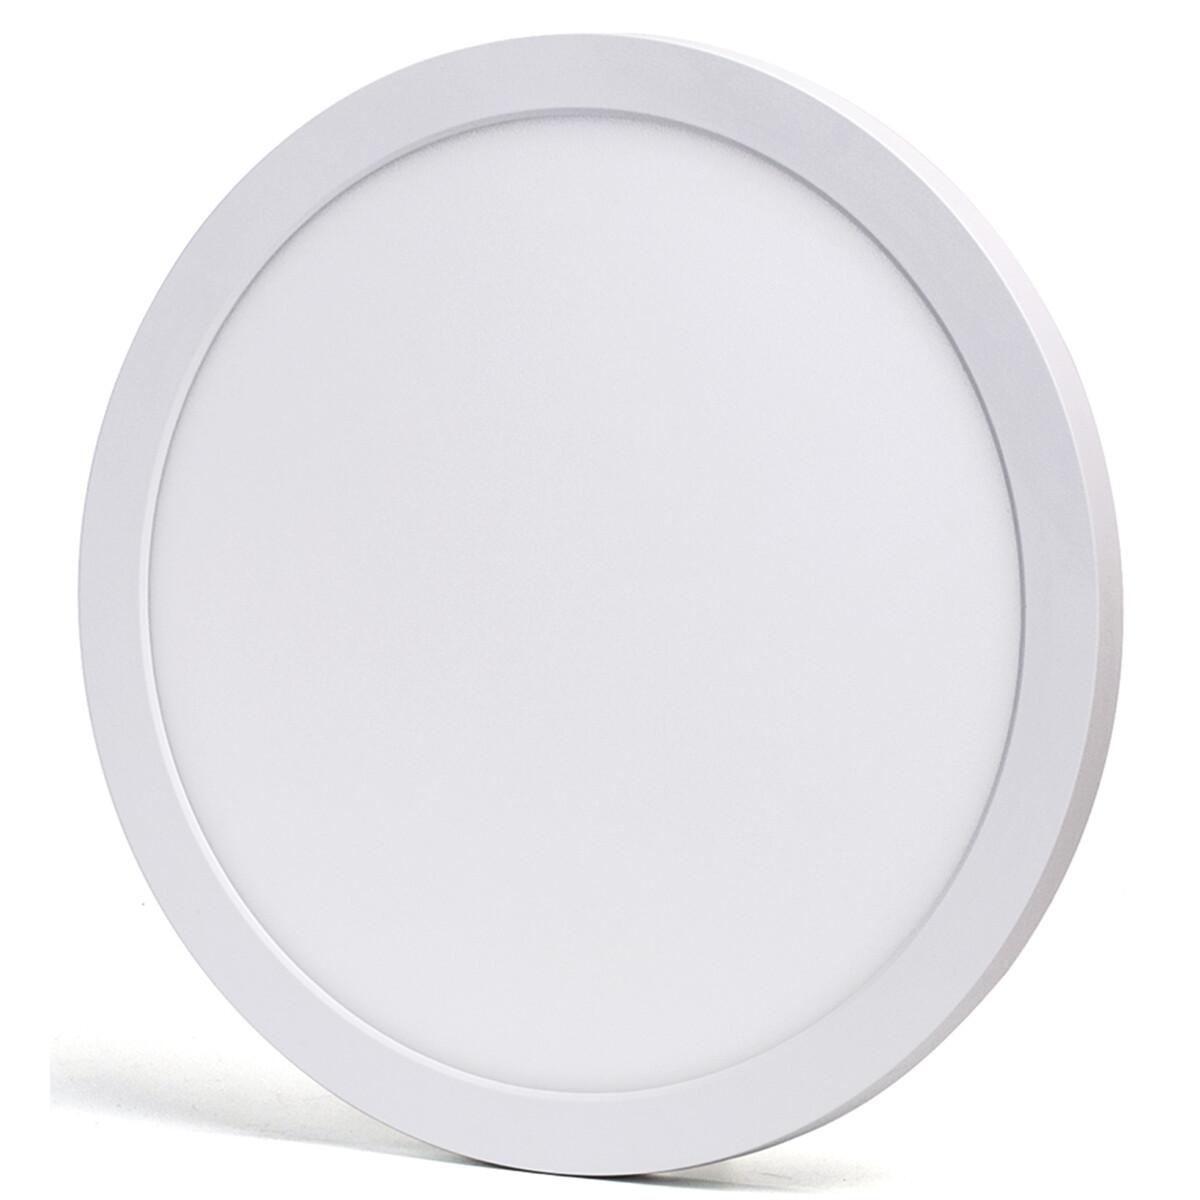 LED Downlight Pro - Aigi Foka - Inbouw/Opbouw - Rond - 30W - Aanpasbare Kleur CCT - Mat Wit - Kunststof